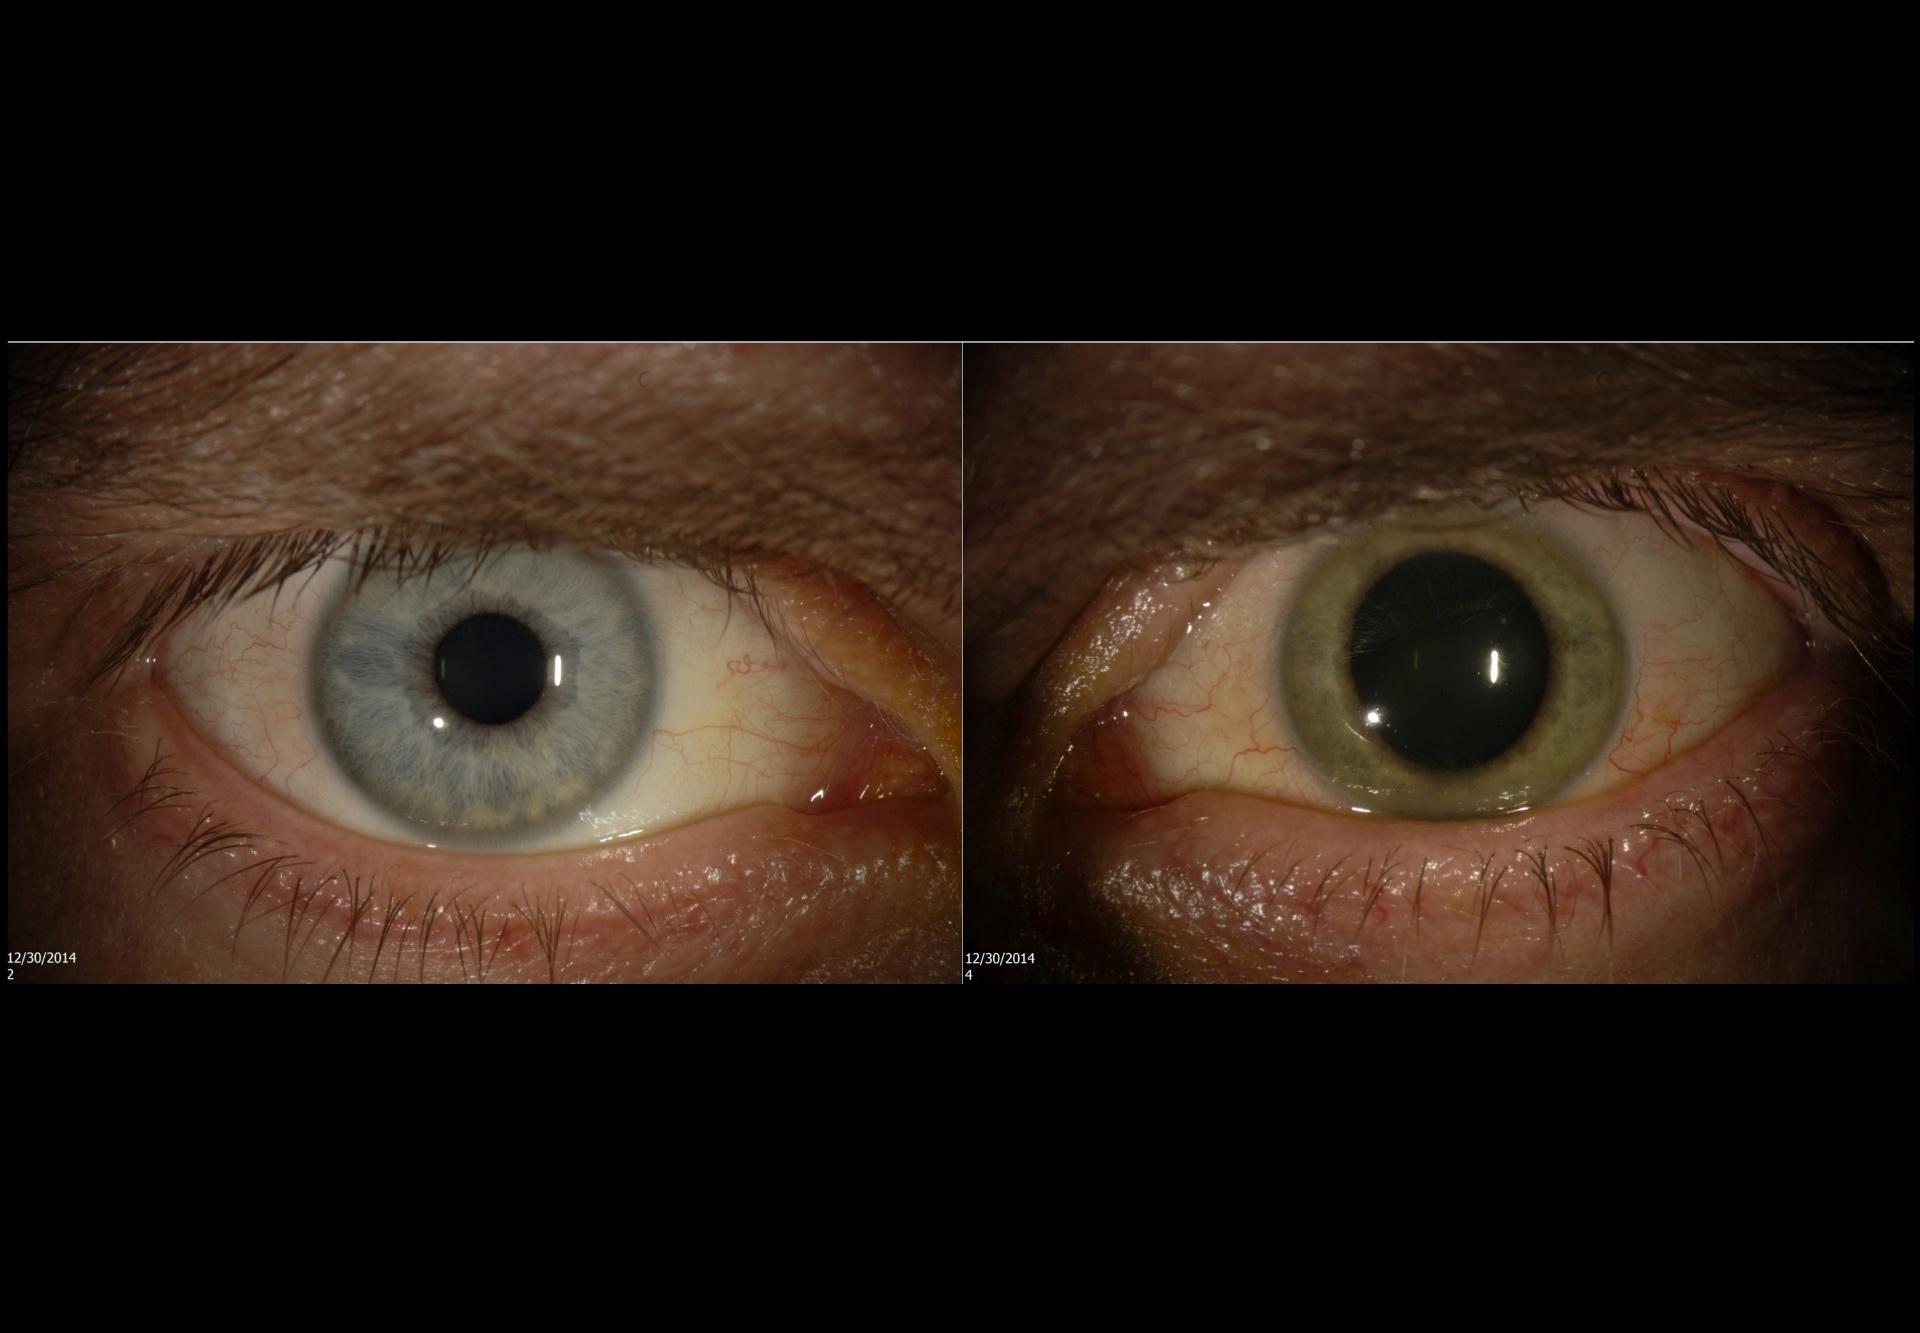 Ebola altera cor de olho de médico de azul para verde